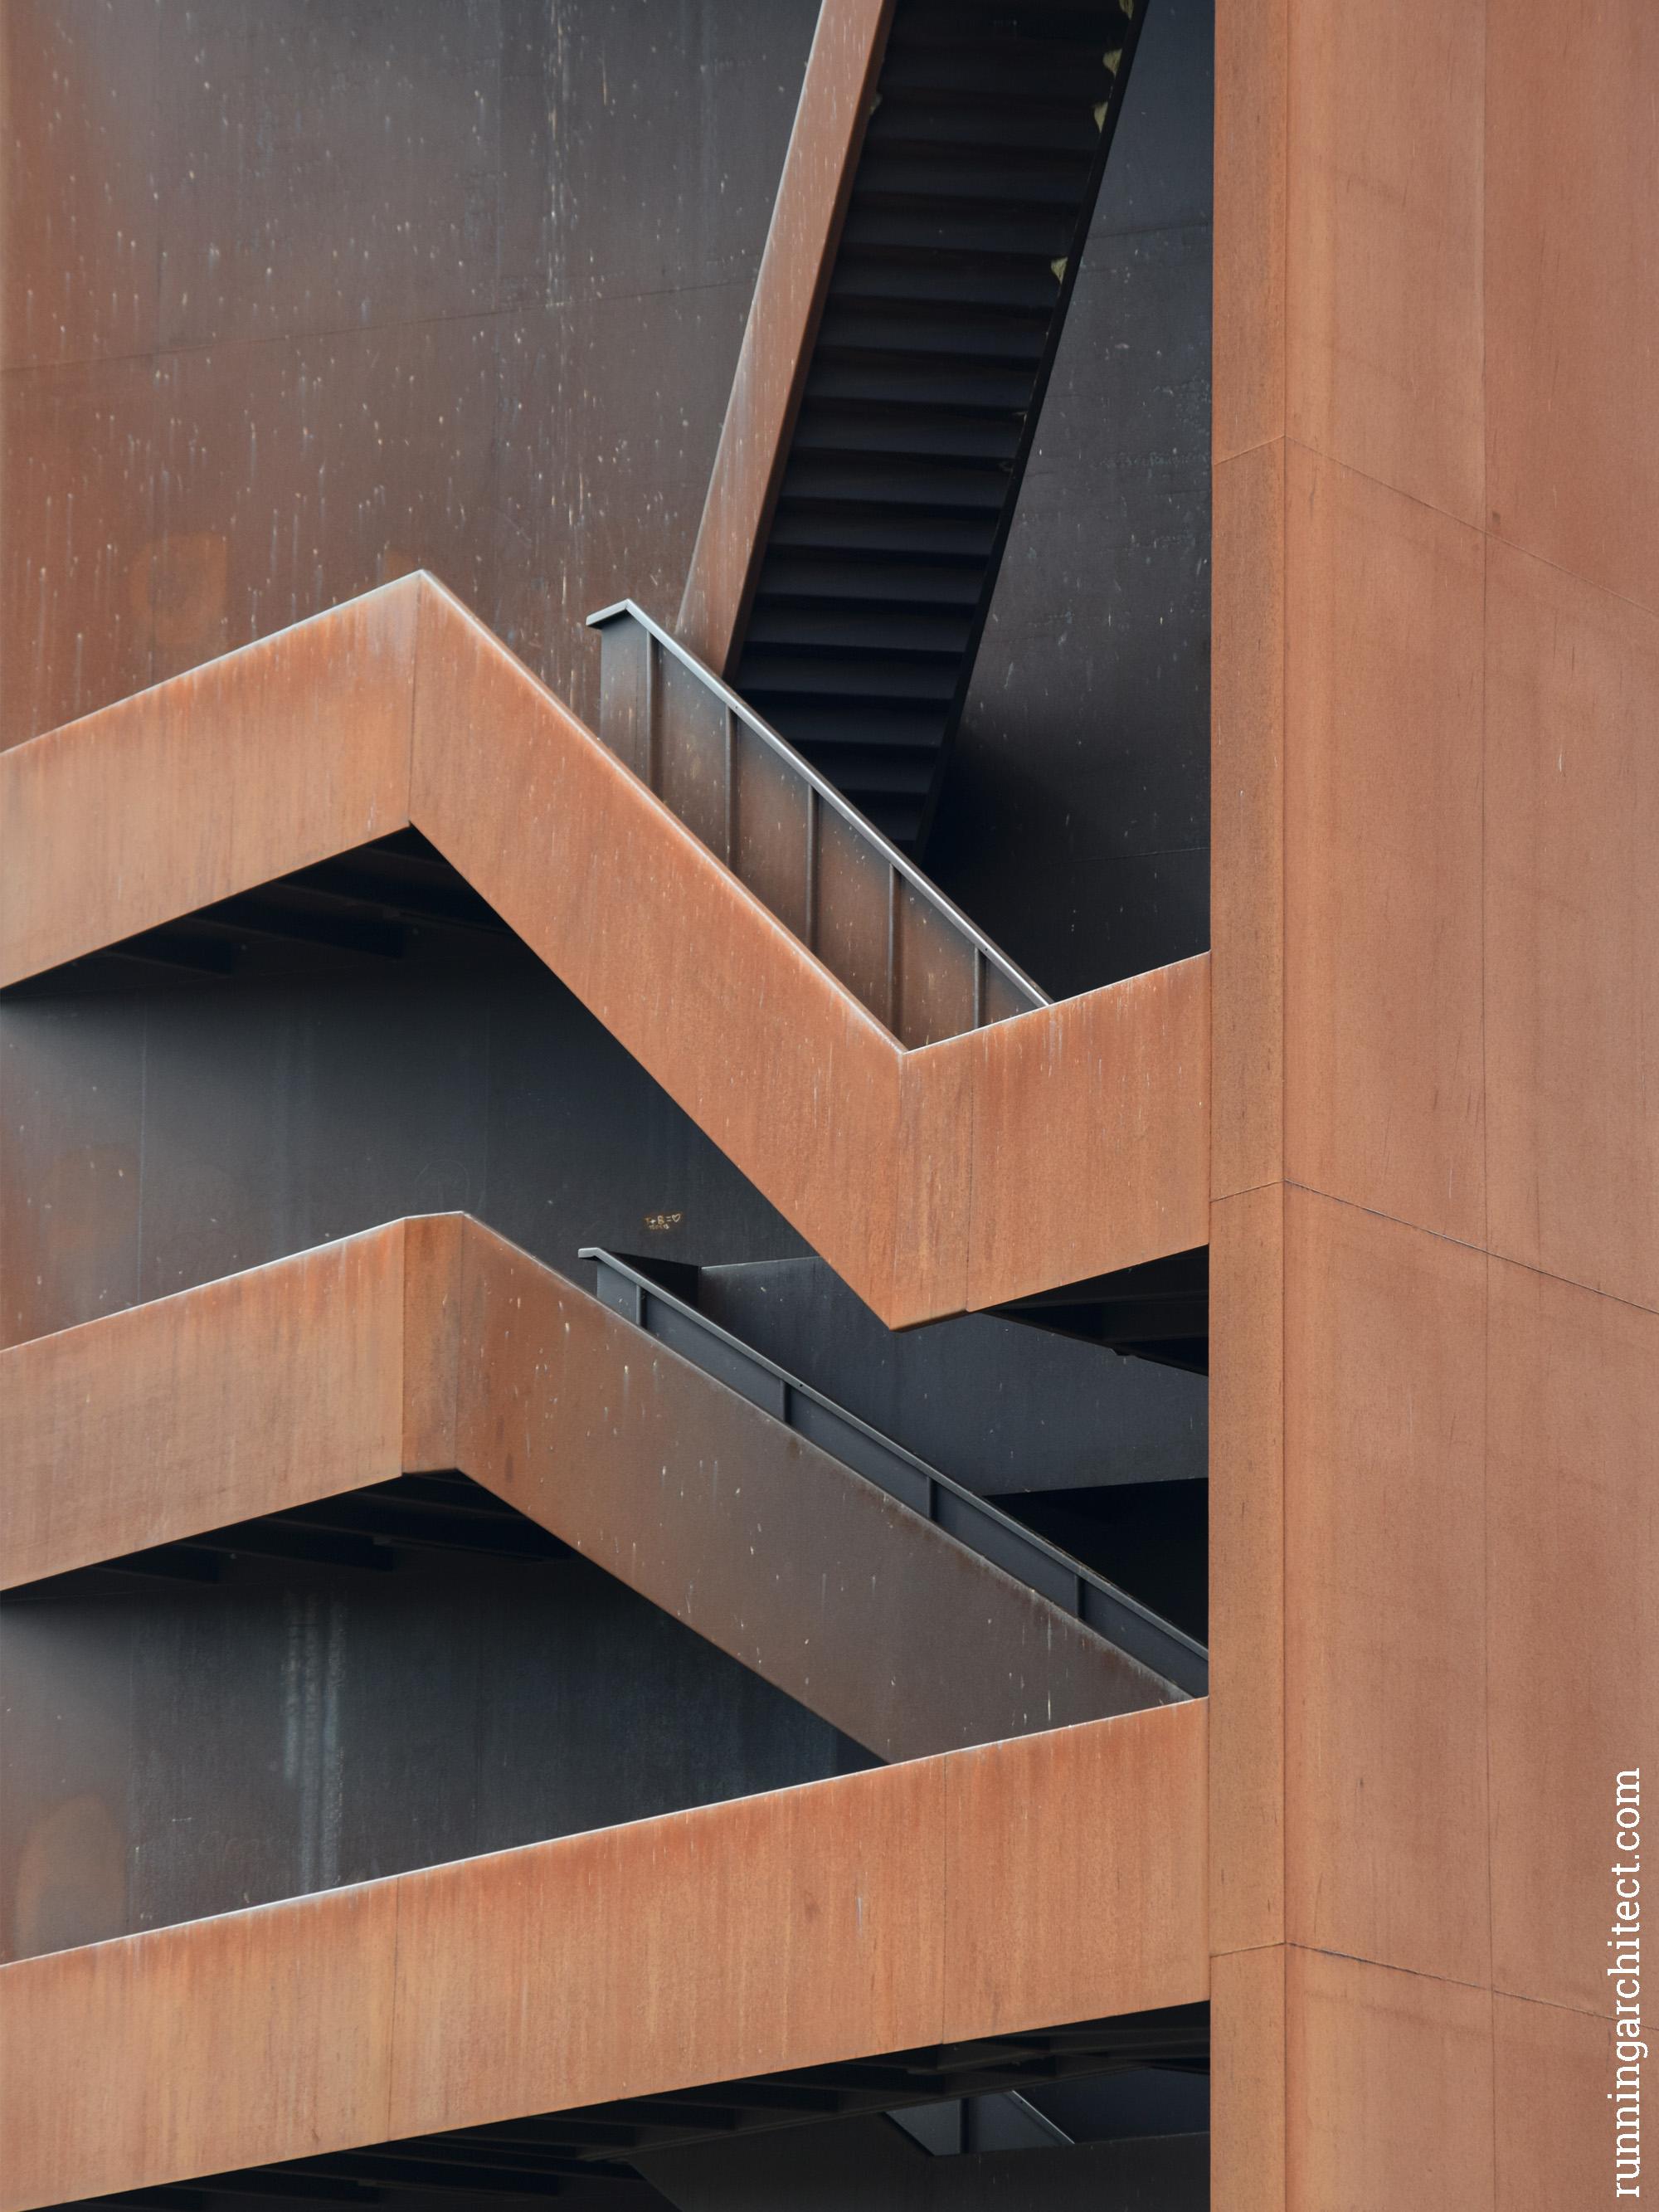 rostiger nagel 11 – running architect.com